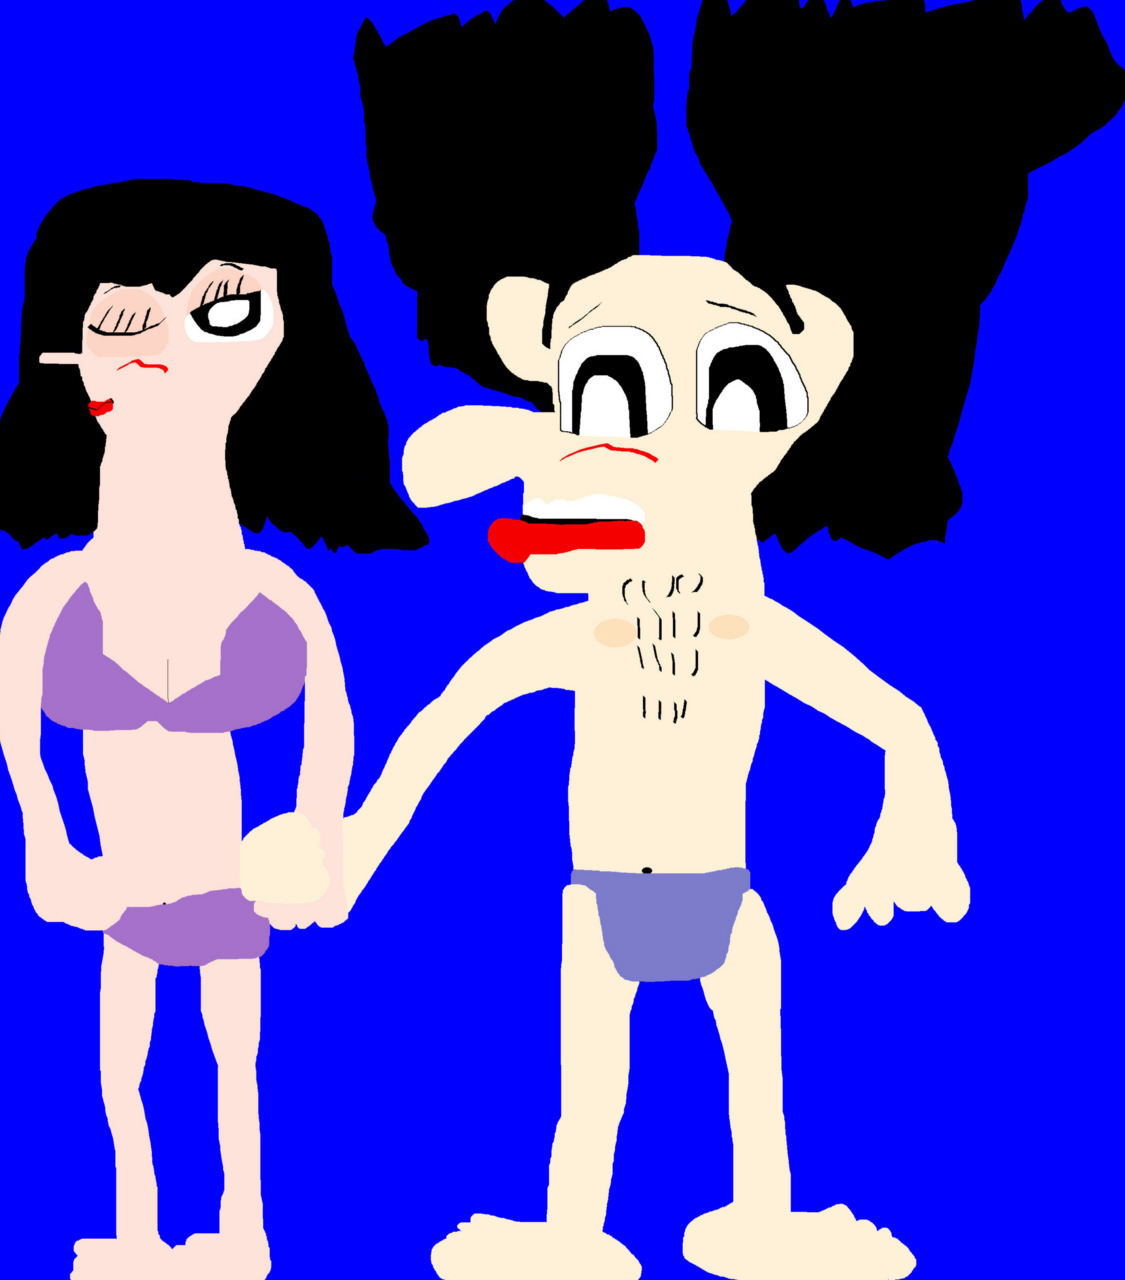 Random Noodman And Darlene In Undergarments Holding Hands MS Paint by Falconlobo